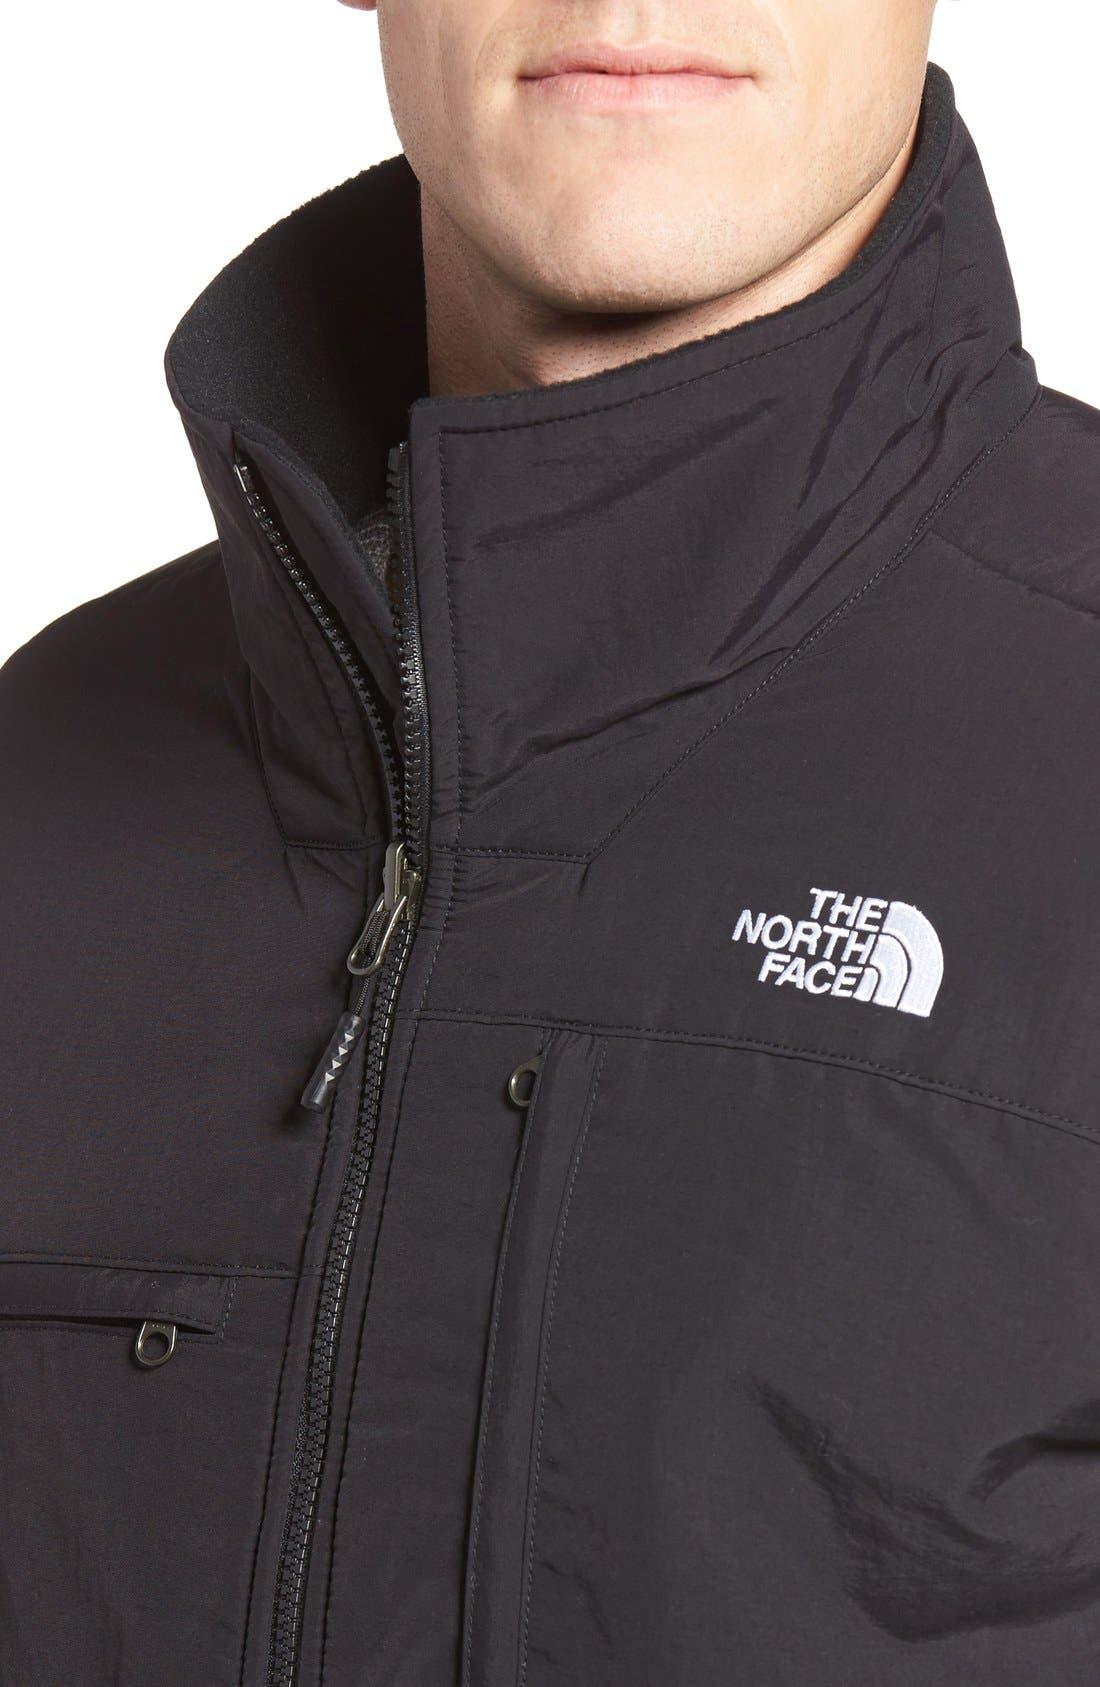 Denali 2 Recycled Fleece Jacket,                             Alternate thumbnail 8, color,                             001